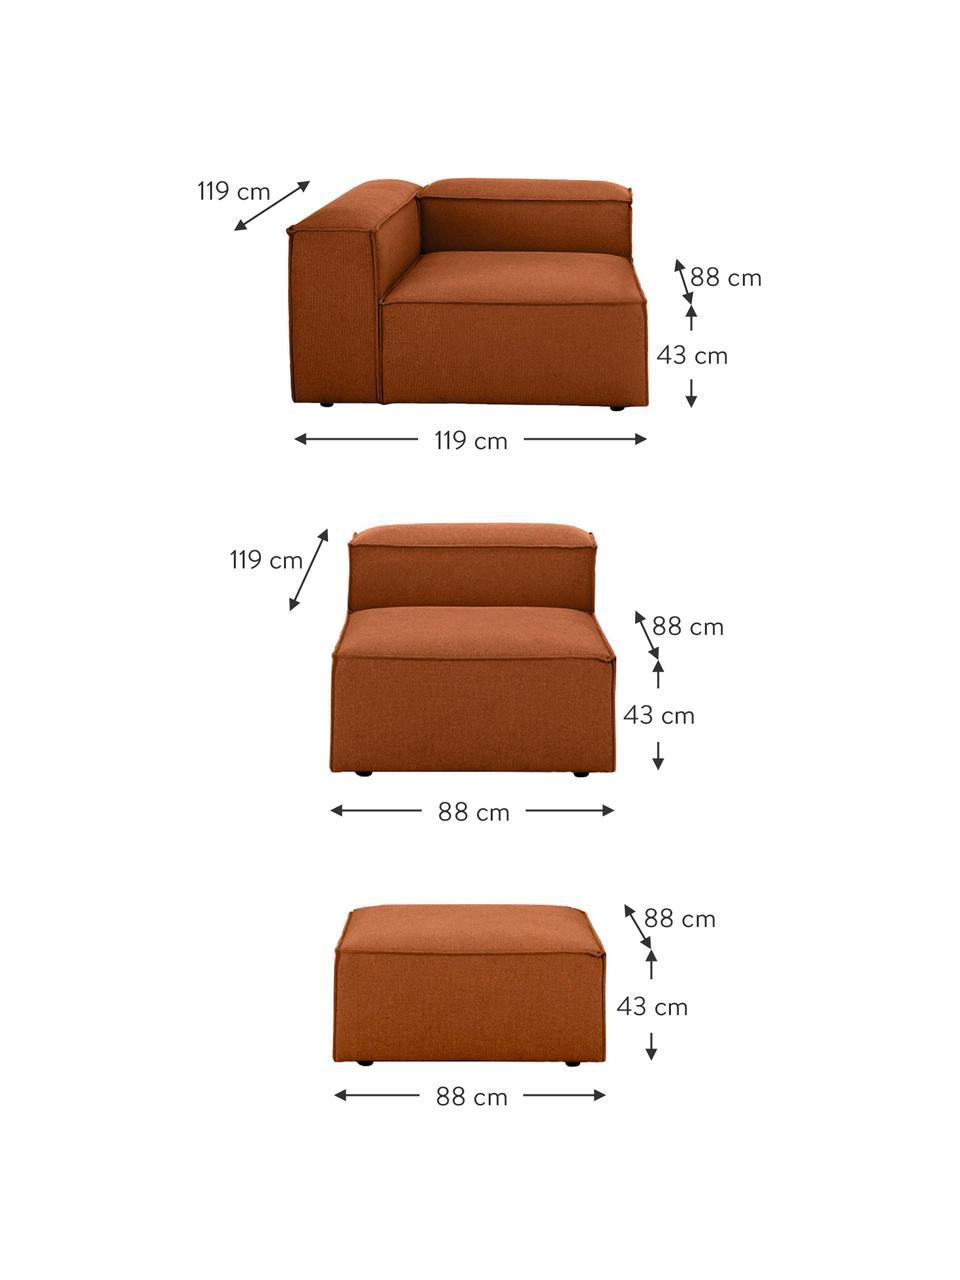 Canapé d'angle modulable terracotta Lennon, Tissu terre cuite